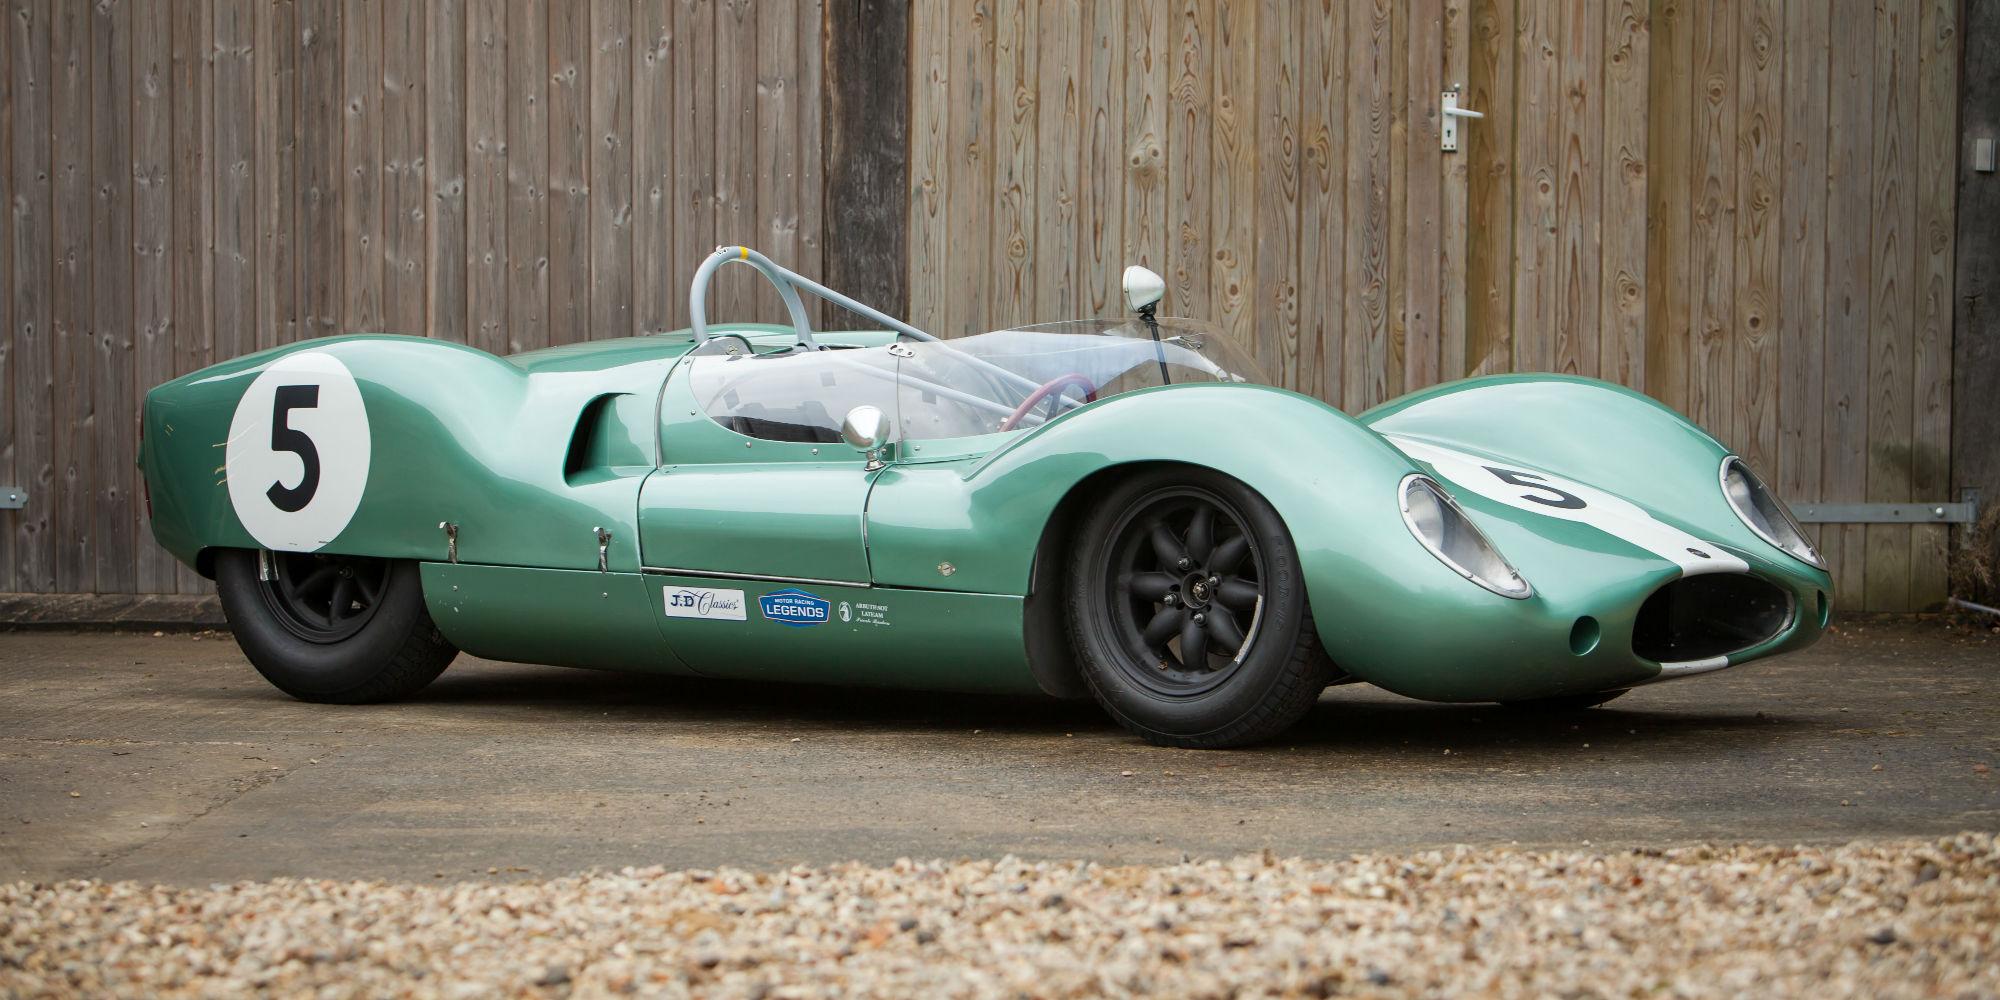 The Ex – Sir Stirling Moss, Bib Stillwell, 'Coil Sprung' 1959 Cooper T49 'Monaco'